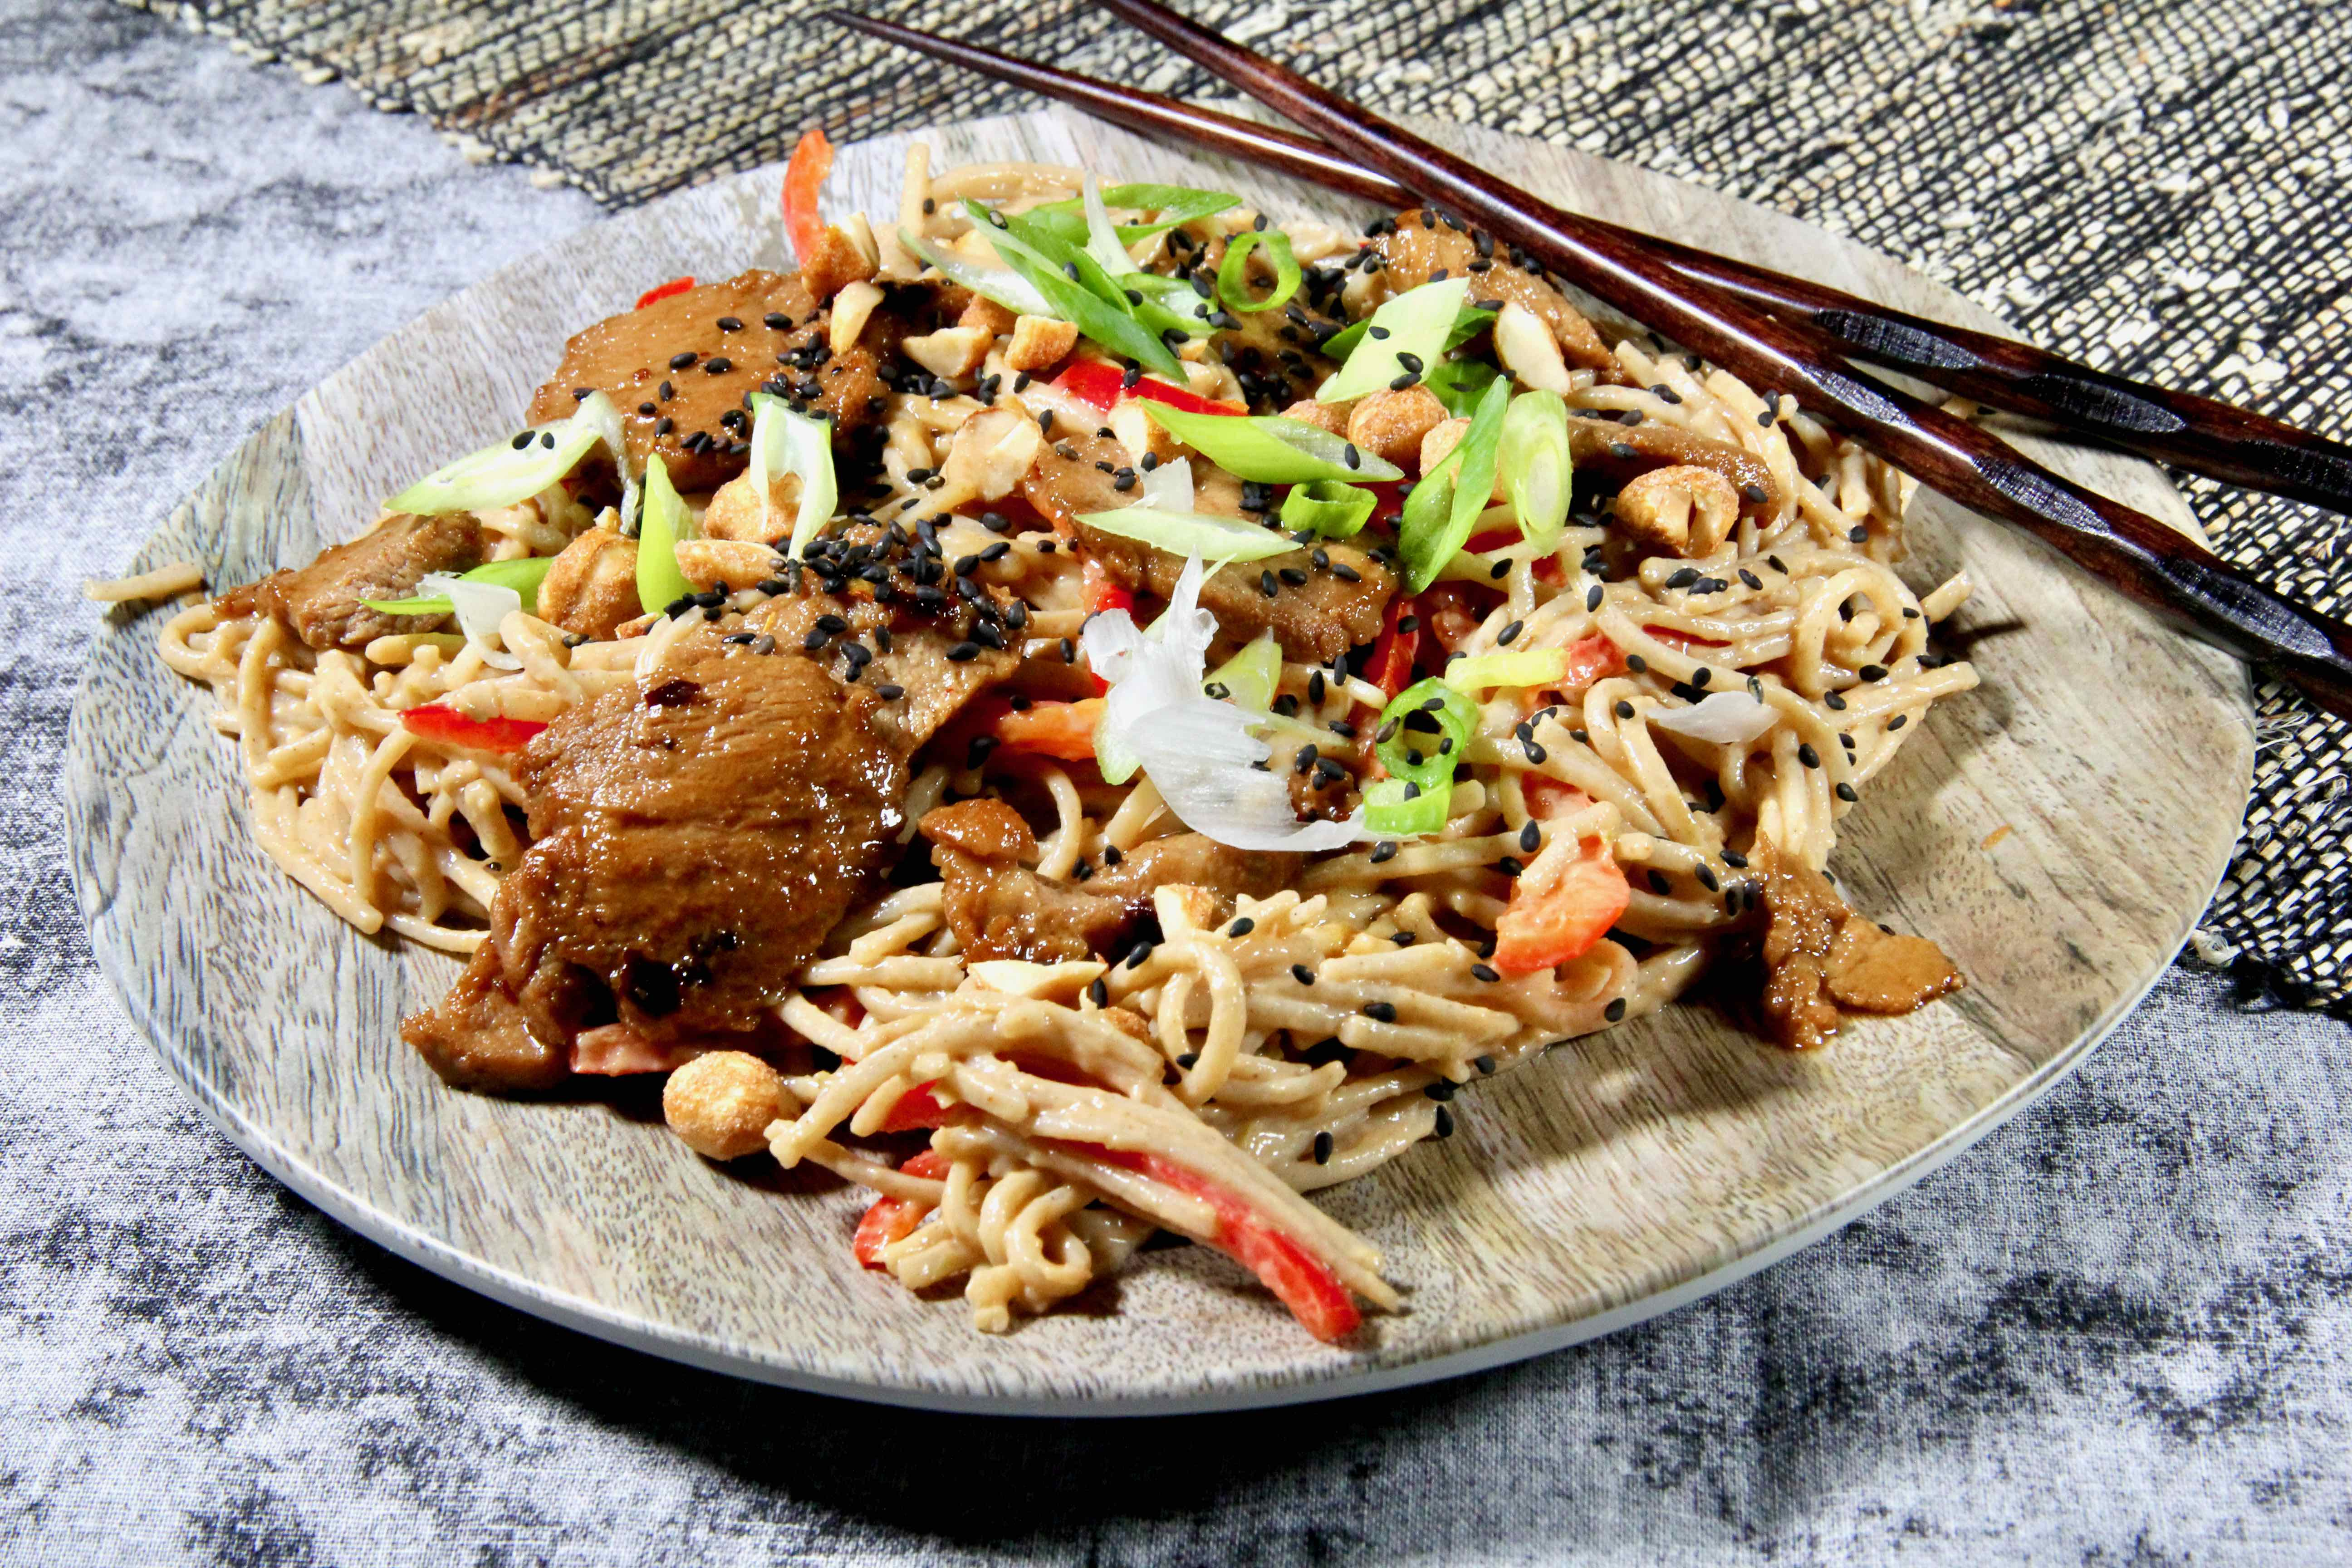 Cold Soba Noodles with Pork Tenderloin